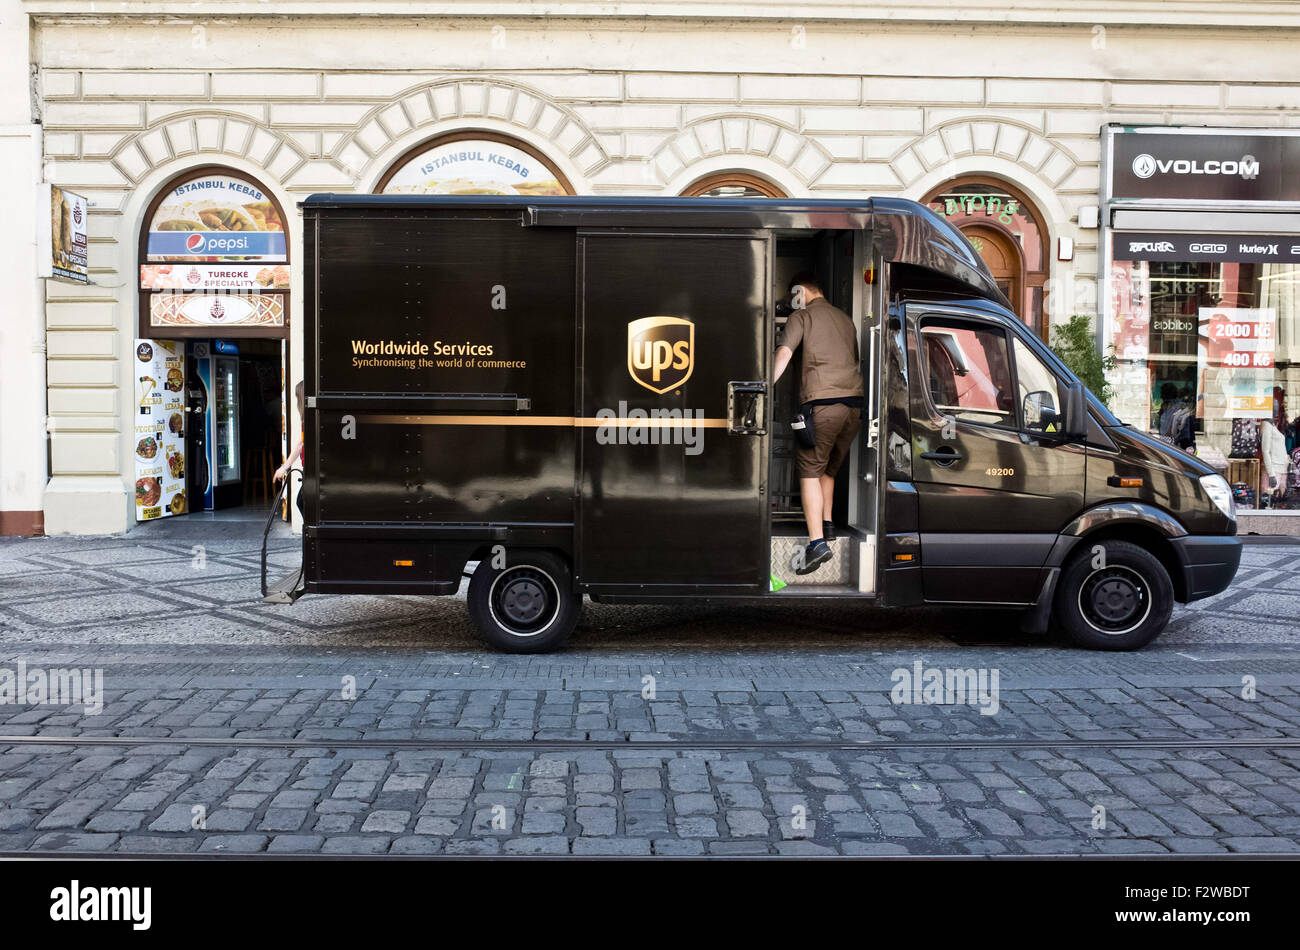 UPS Post Lieferwagen Stockbild